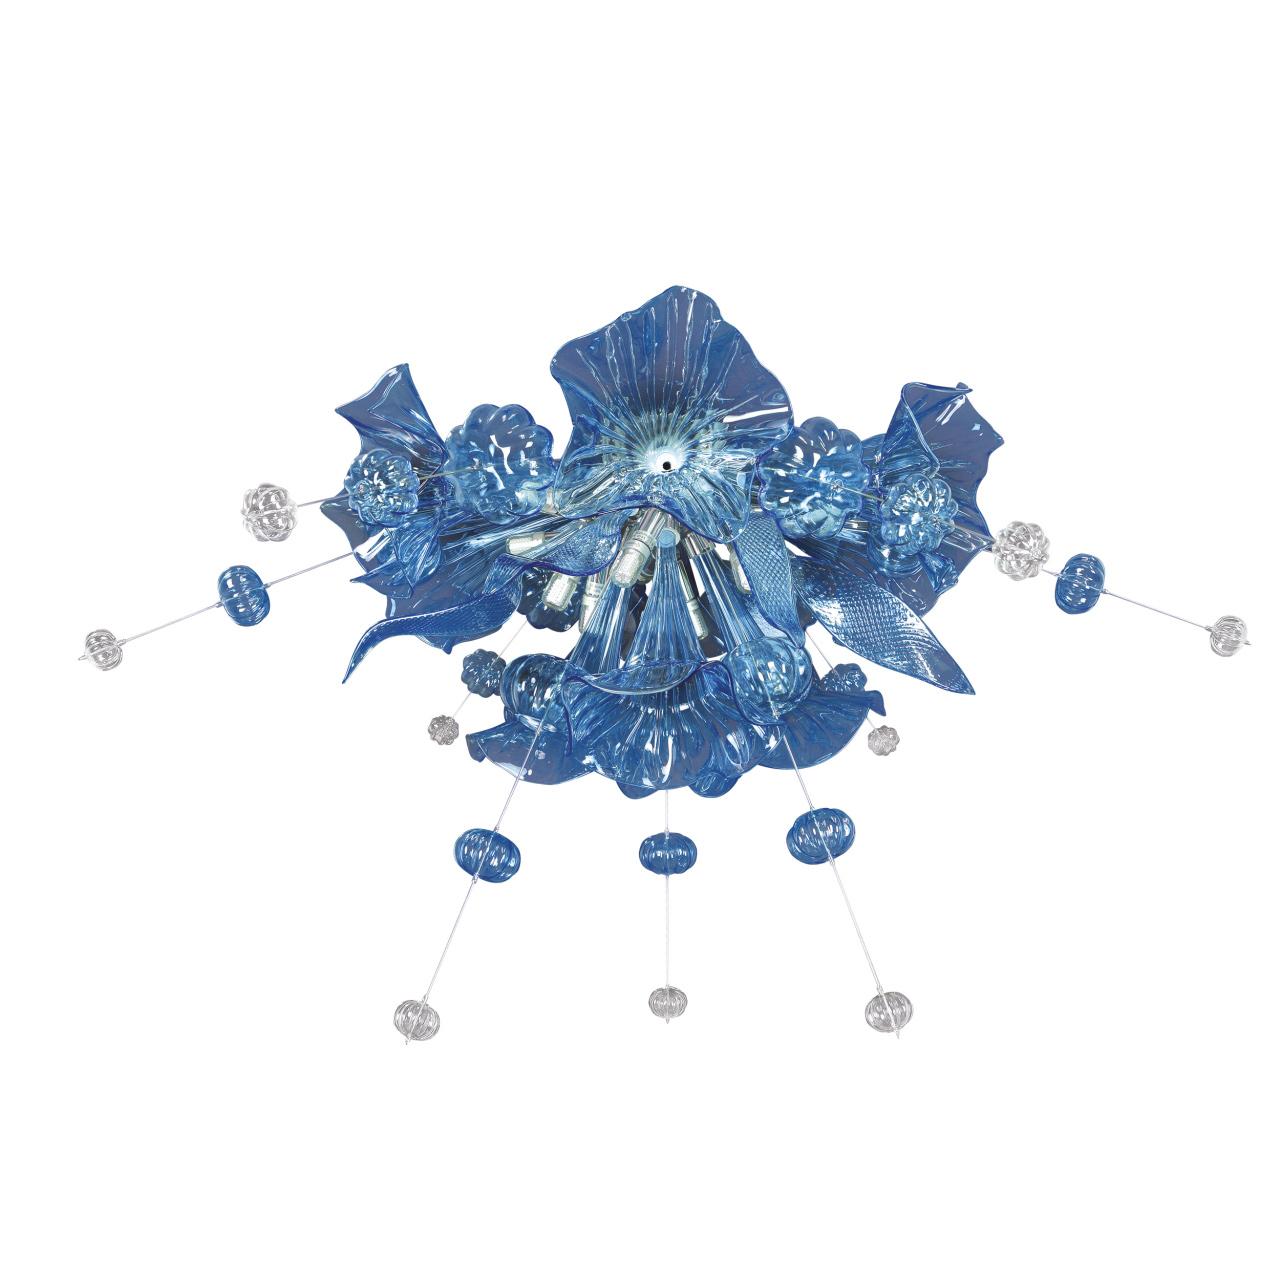 Люстра потолочная Celesta 12х6W (Led) G9 небесно голубой Lightstar 893021